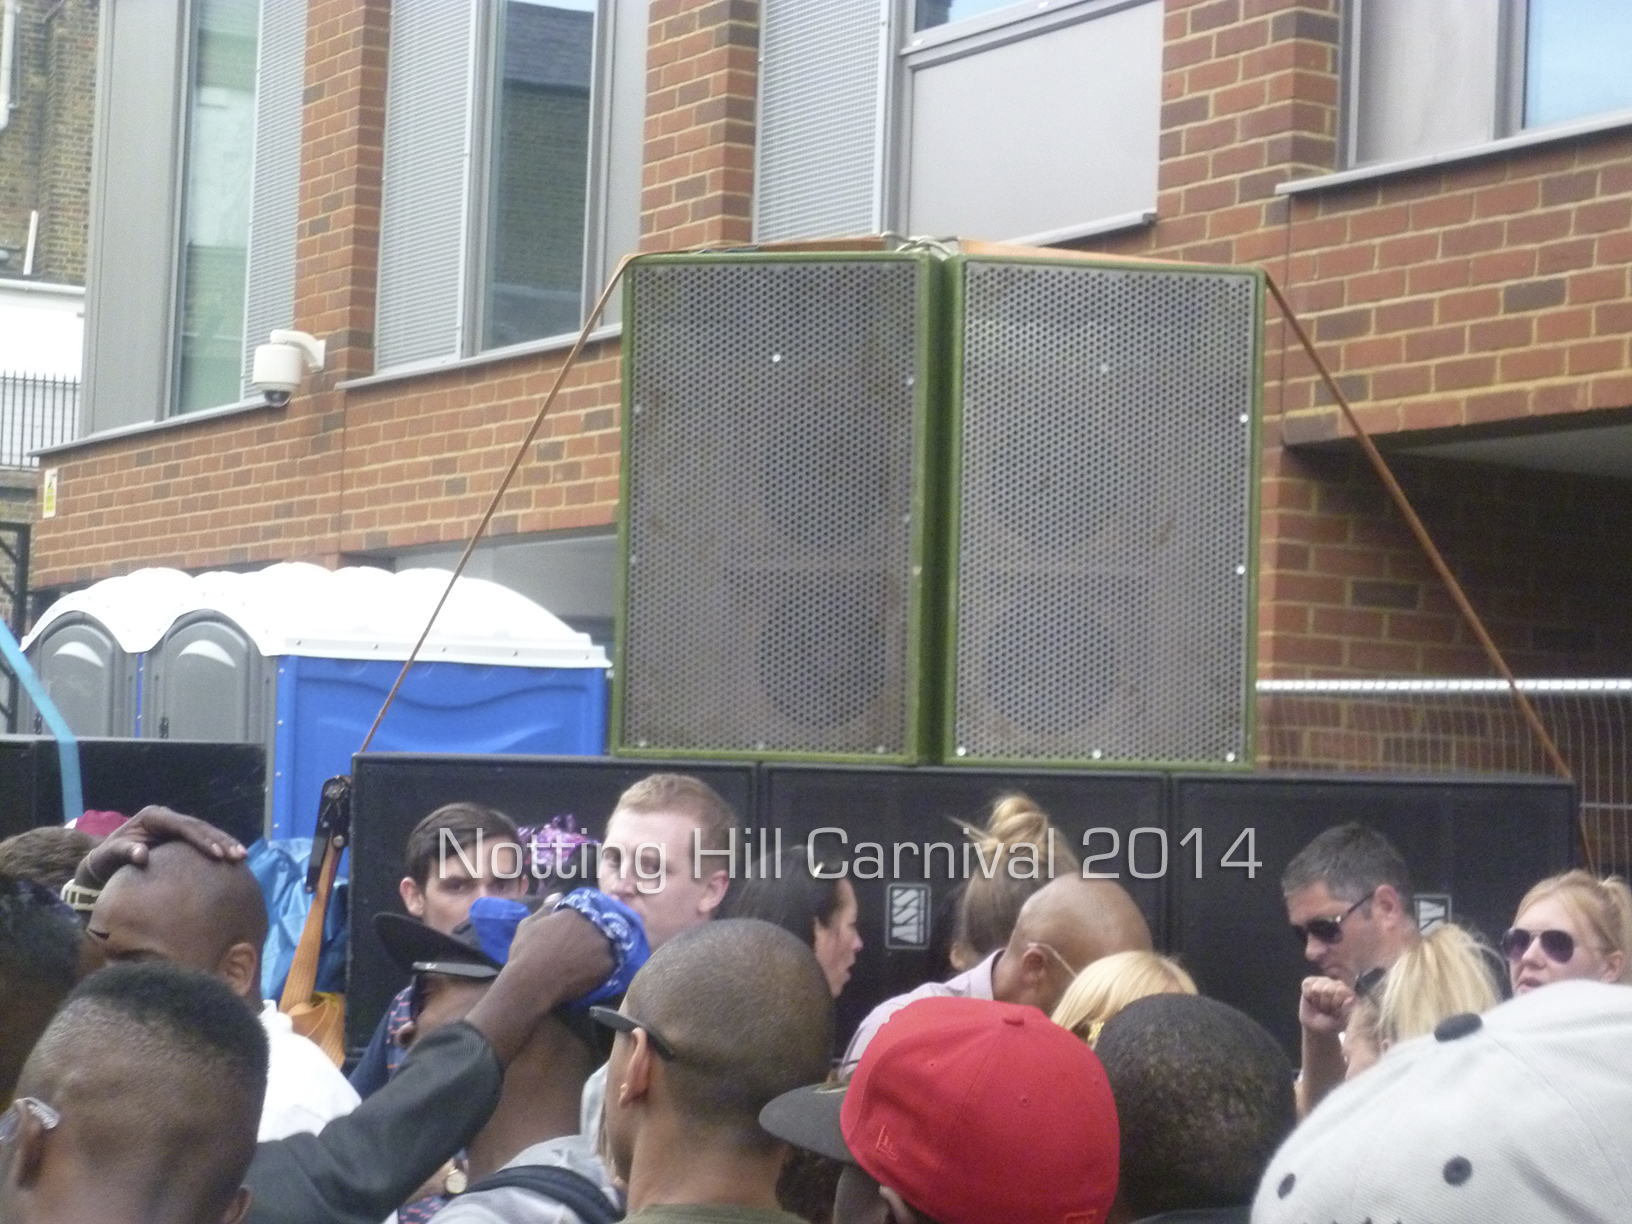 Notting-Hill-Carnival-2014-Street-Sound-System-21